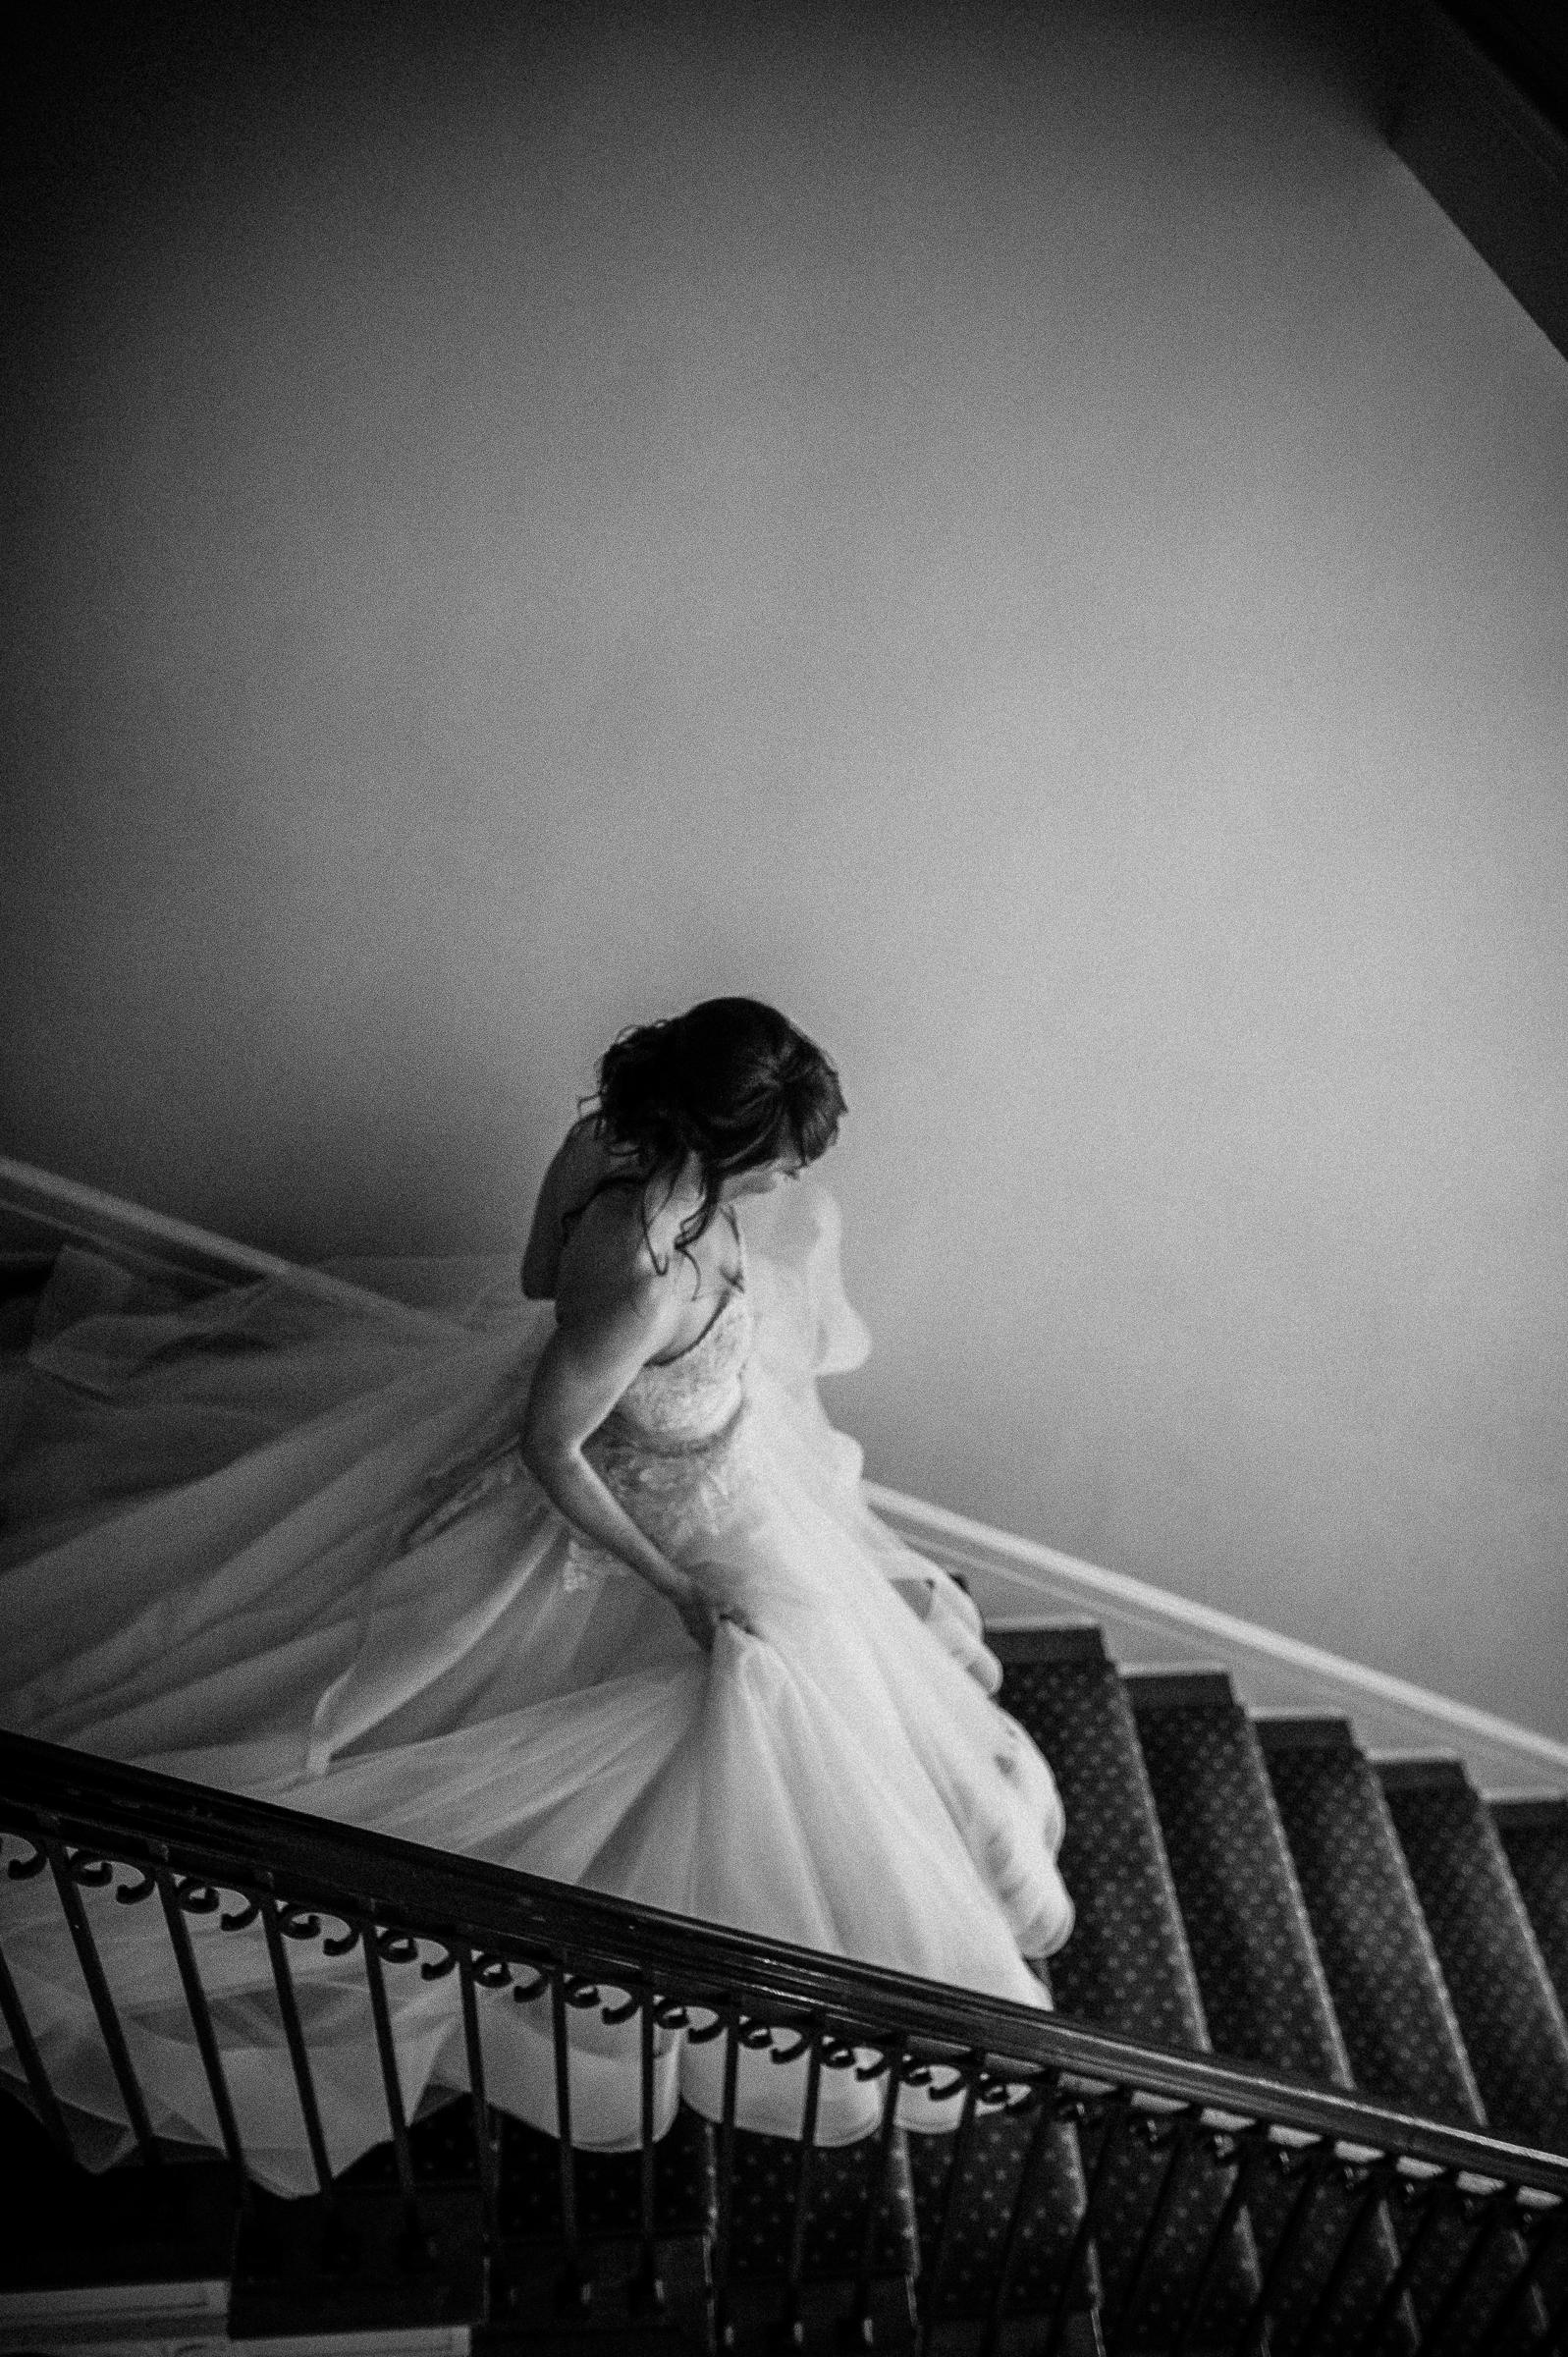 Moody bride descending stairs by Richard Israel